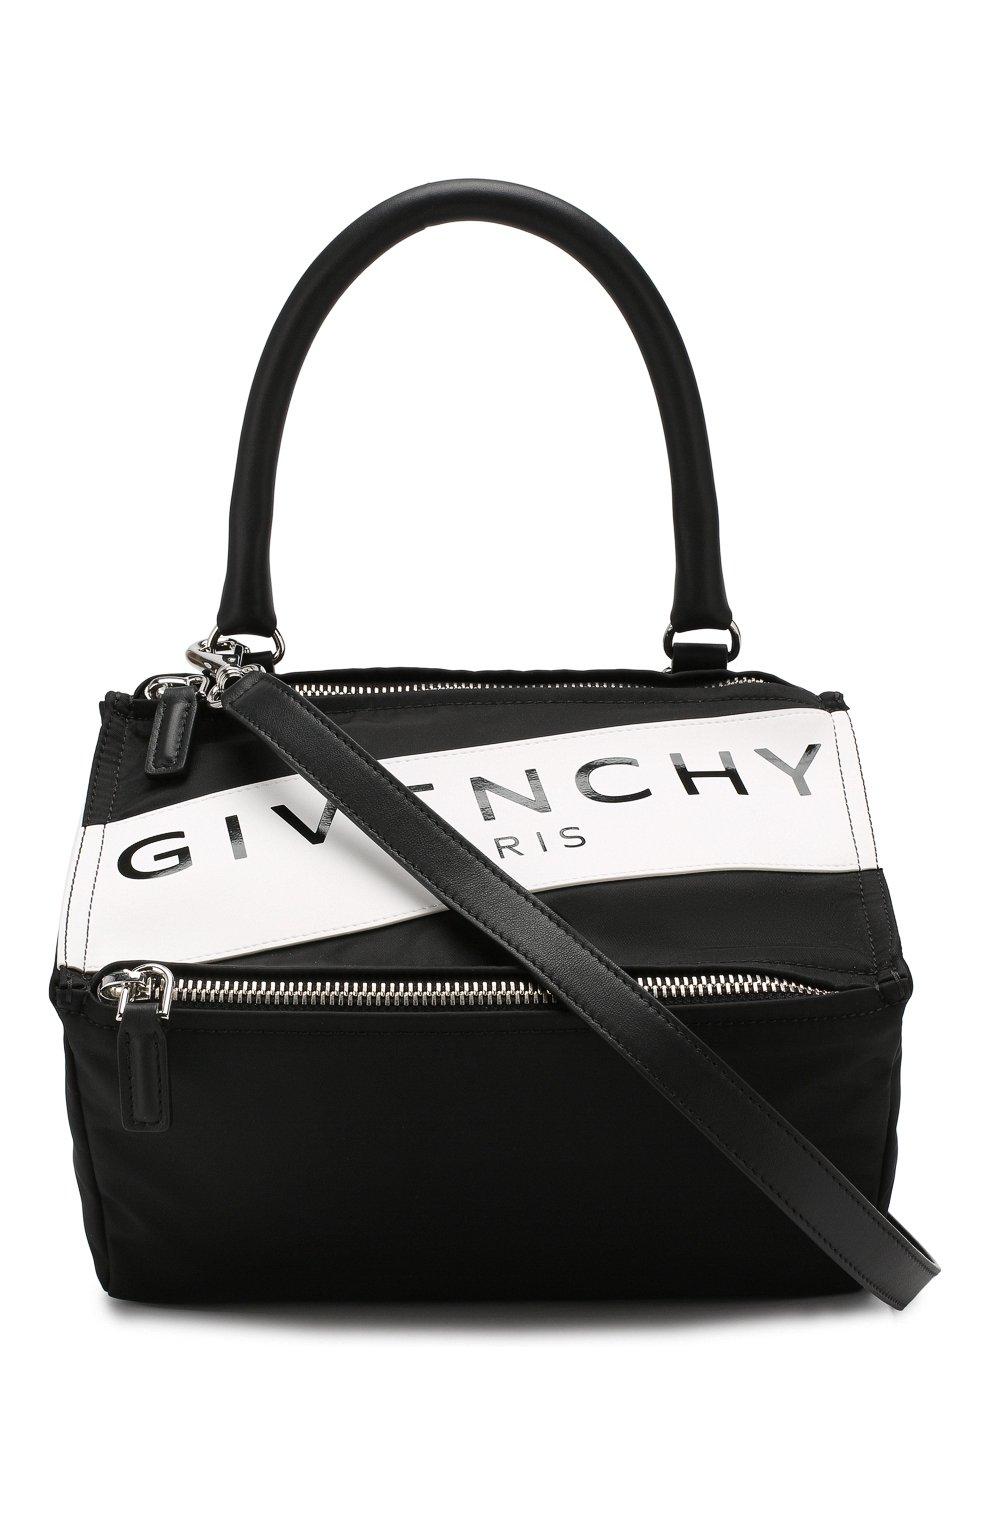 Сумка Pandora small Givenchy черная цвета | Фото №1